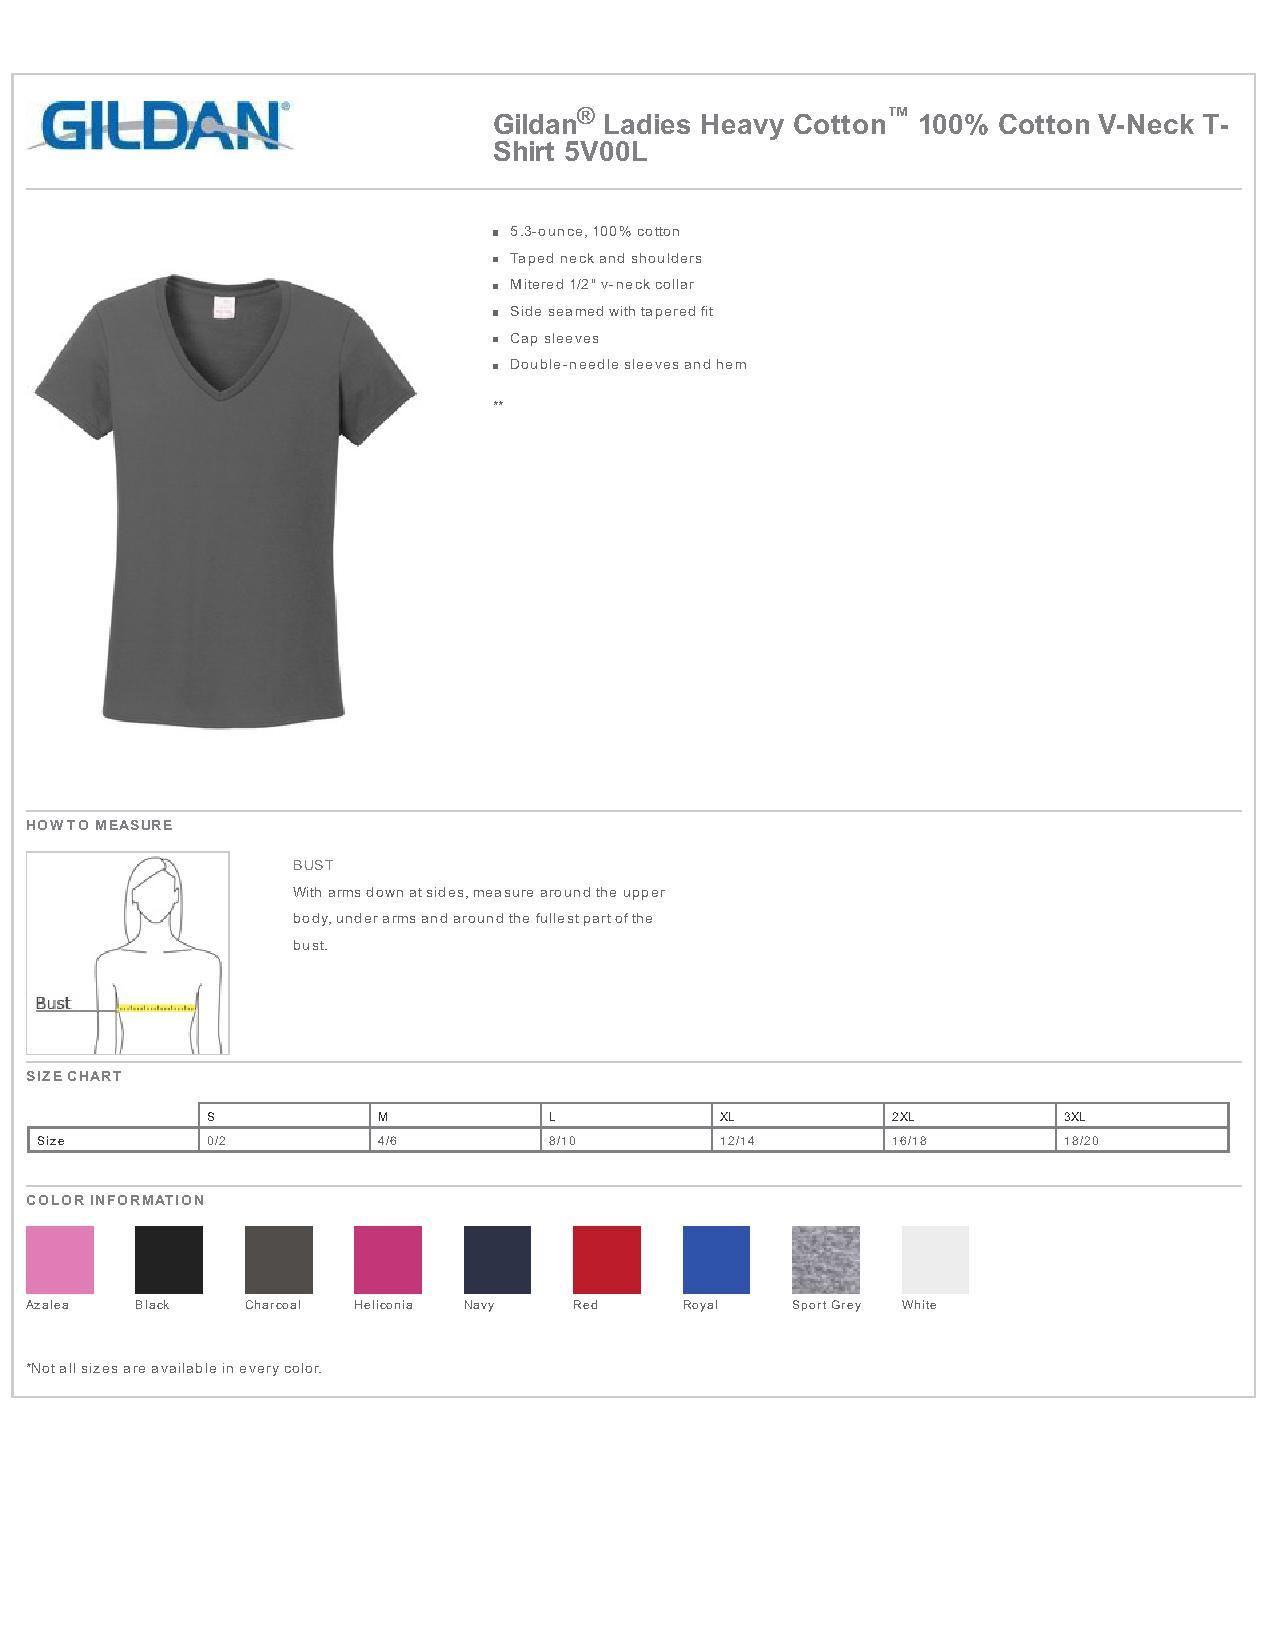 Gildan 5v00l ladies heavy cotton 100 cotton v neck t for Gildan t shirt size chart